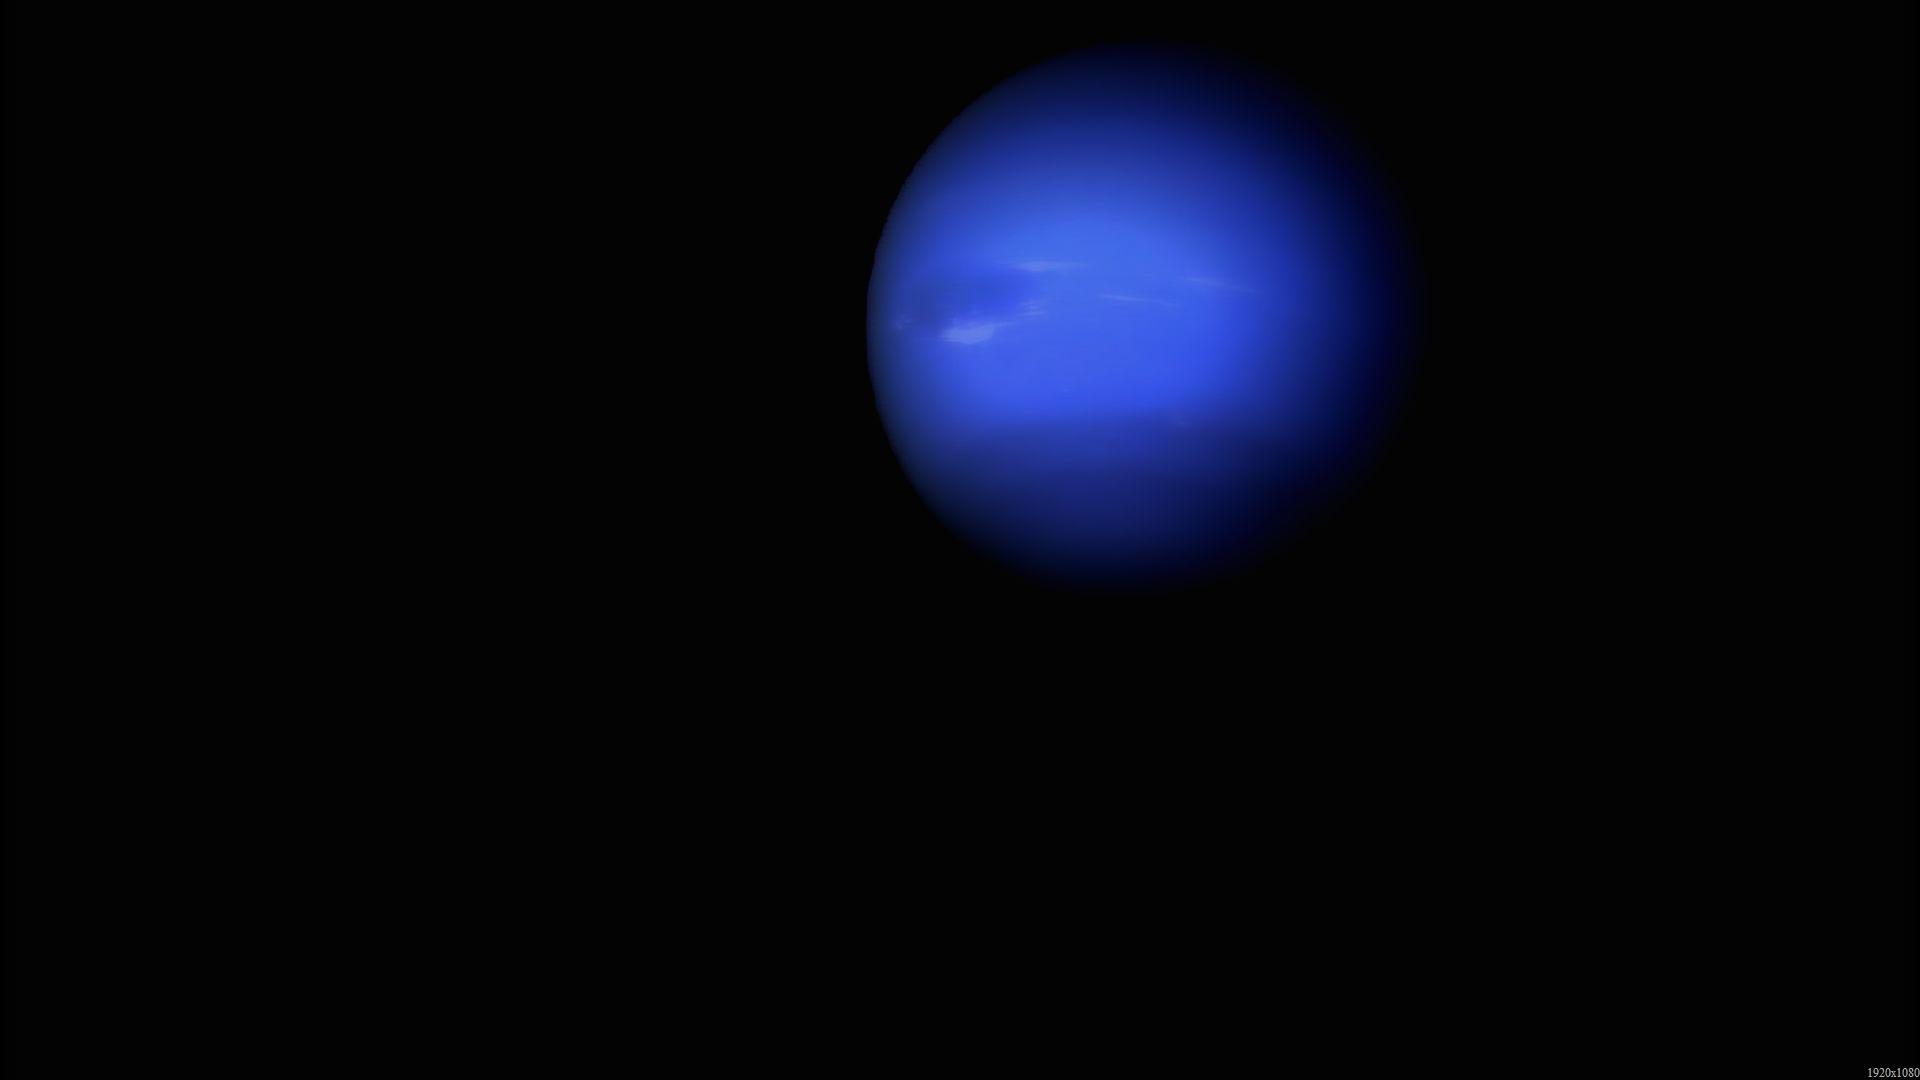 Neptune wallpaper 1920x1080 78060 1920x1080